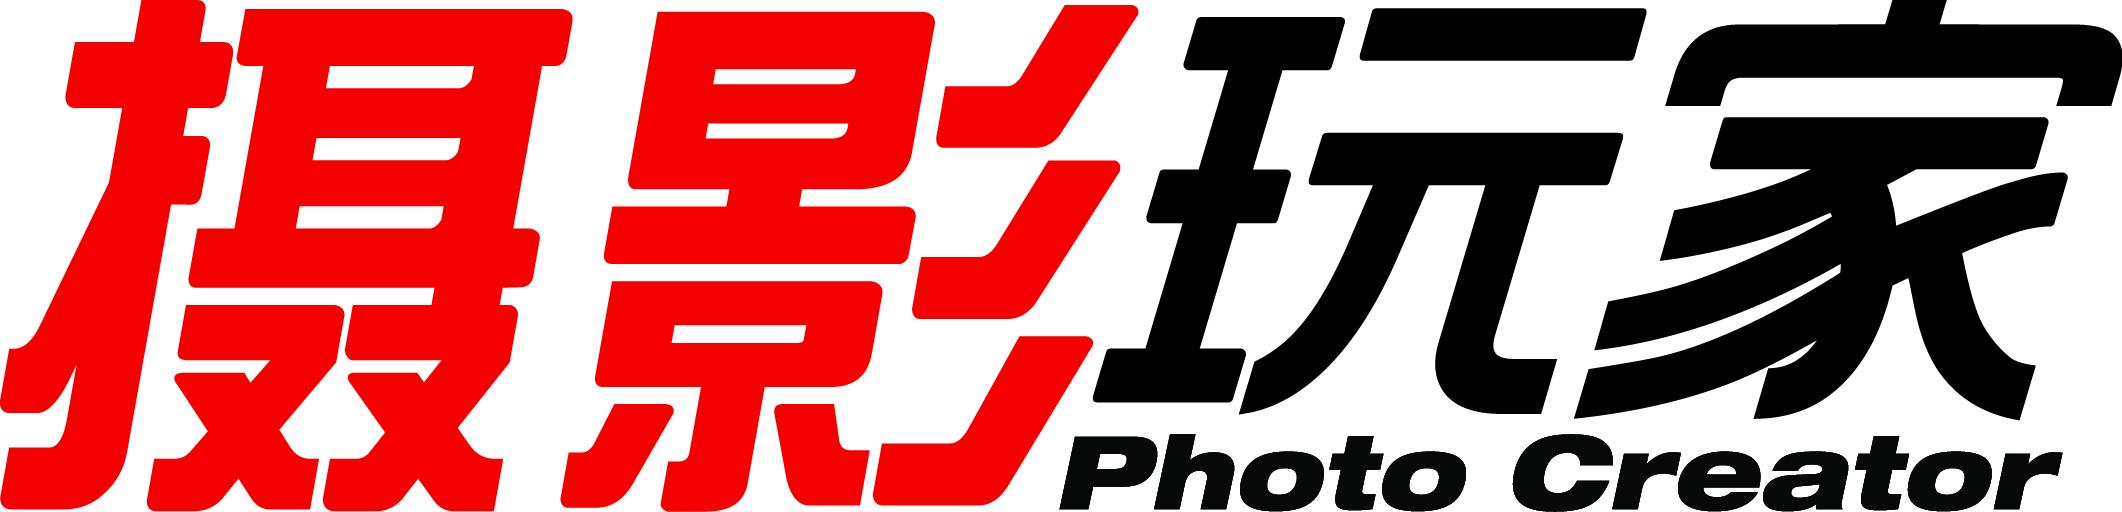 PhotoCreator